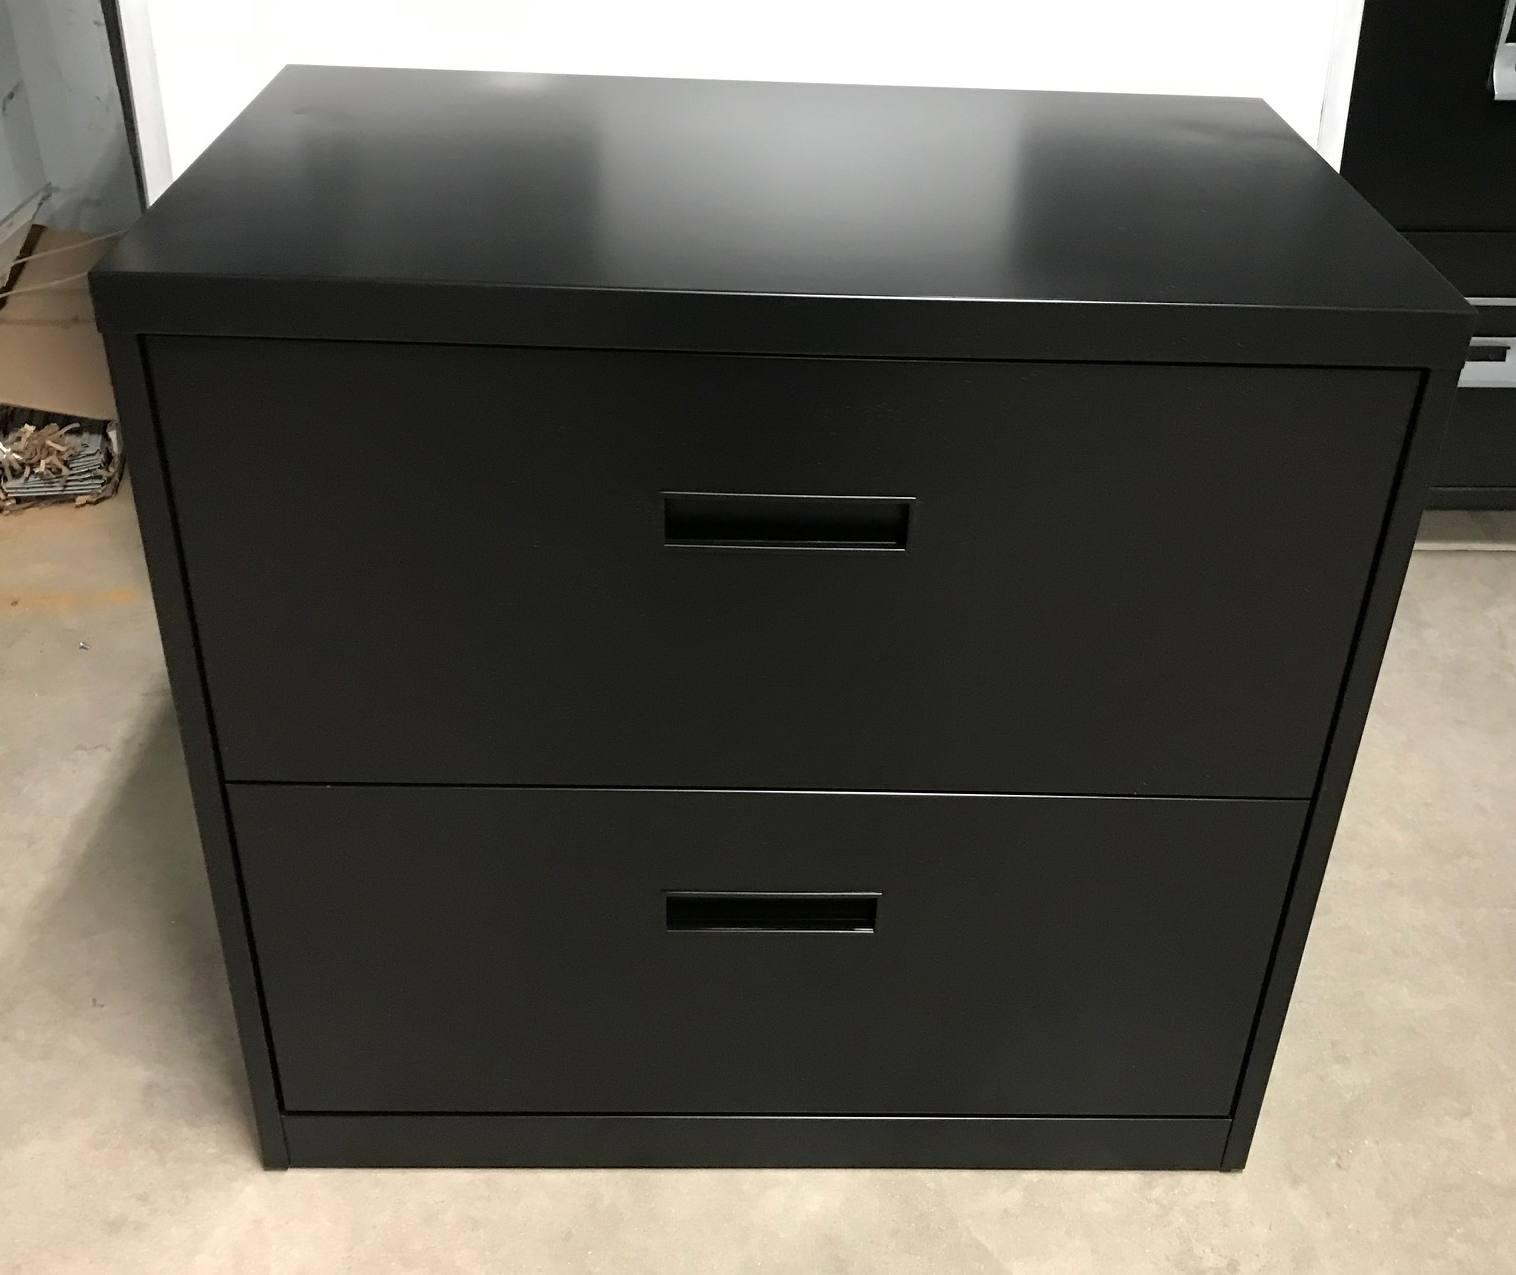 2 Drawer Steelcase Brand 30 Wide Black